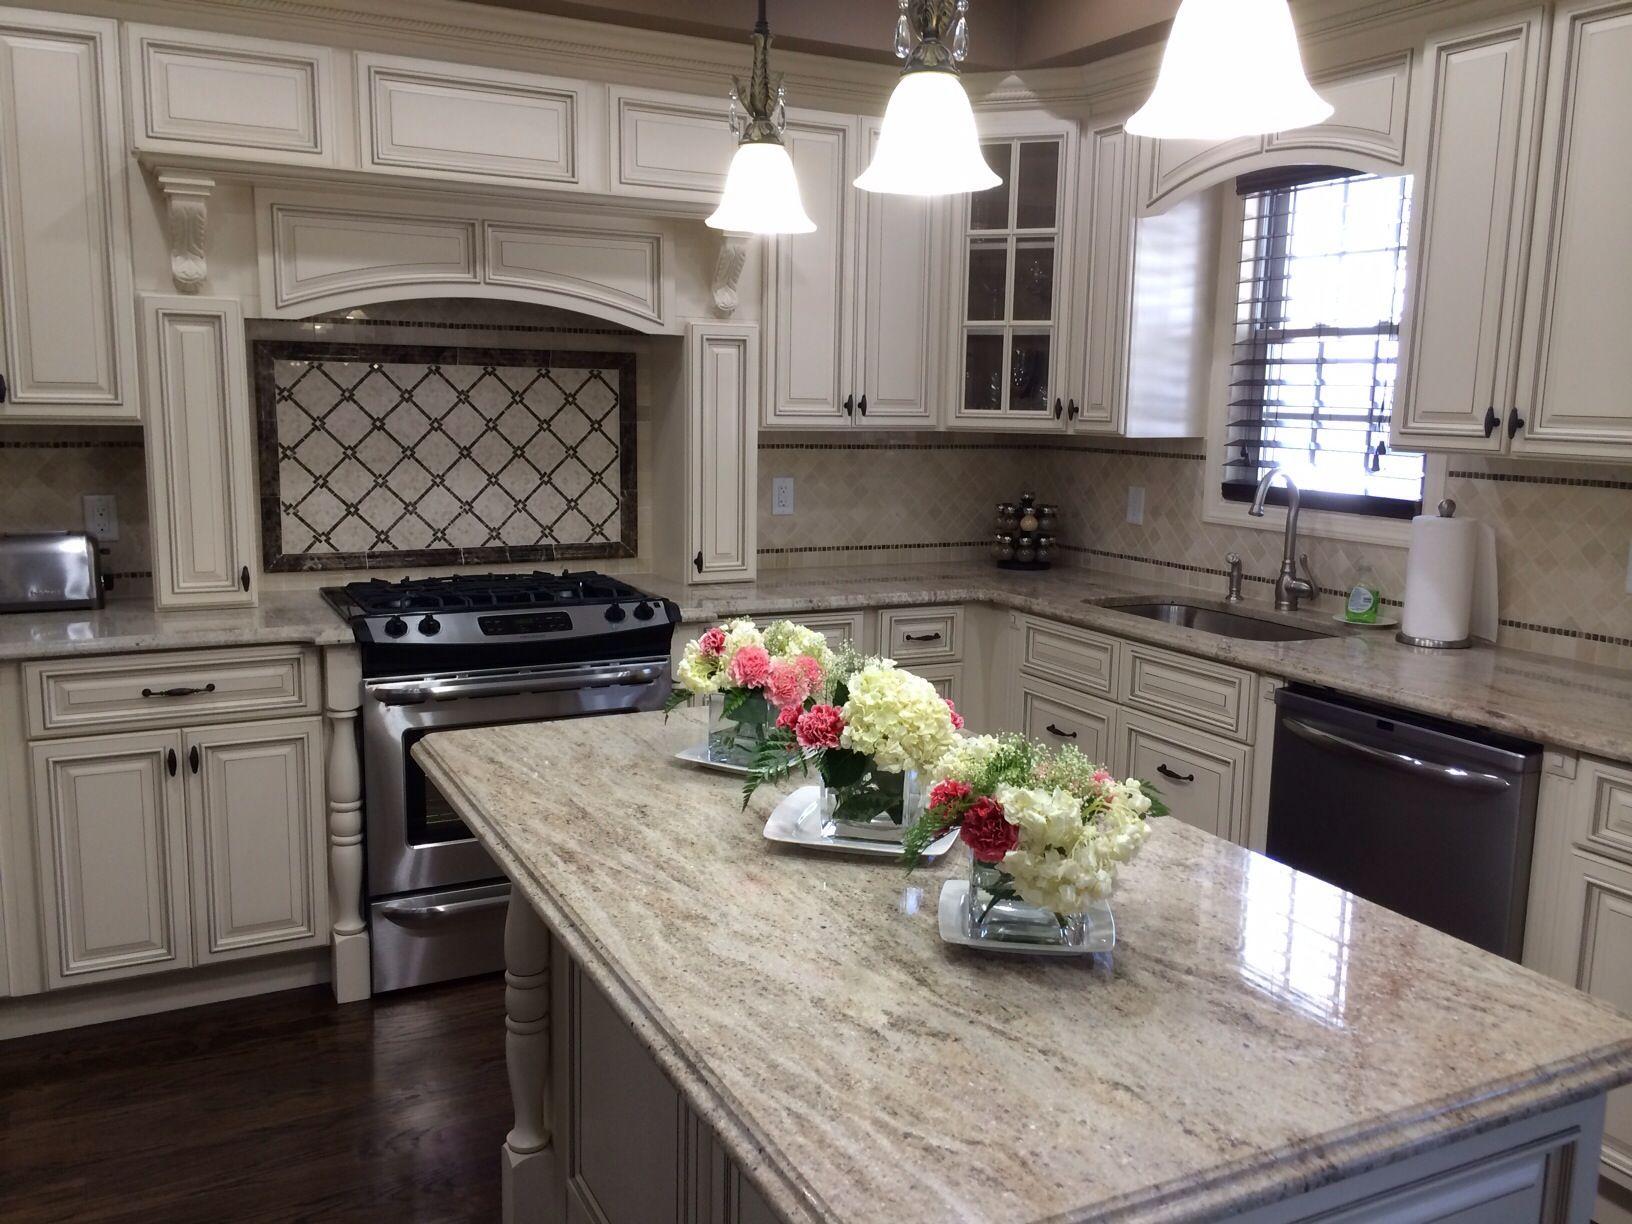 Tsg Signature White With Cream Valentino Granite Top Kitchen Remodel Kitchen Remodel Small Off White Kitchen Cabinets